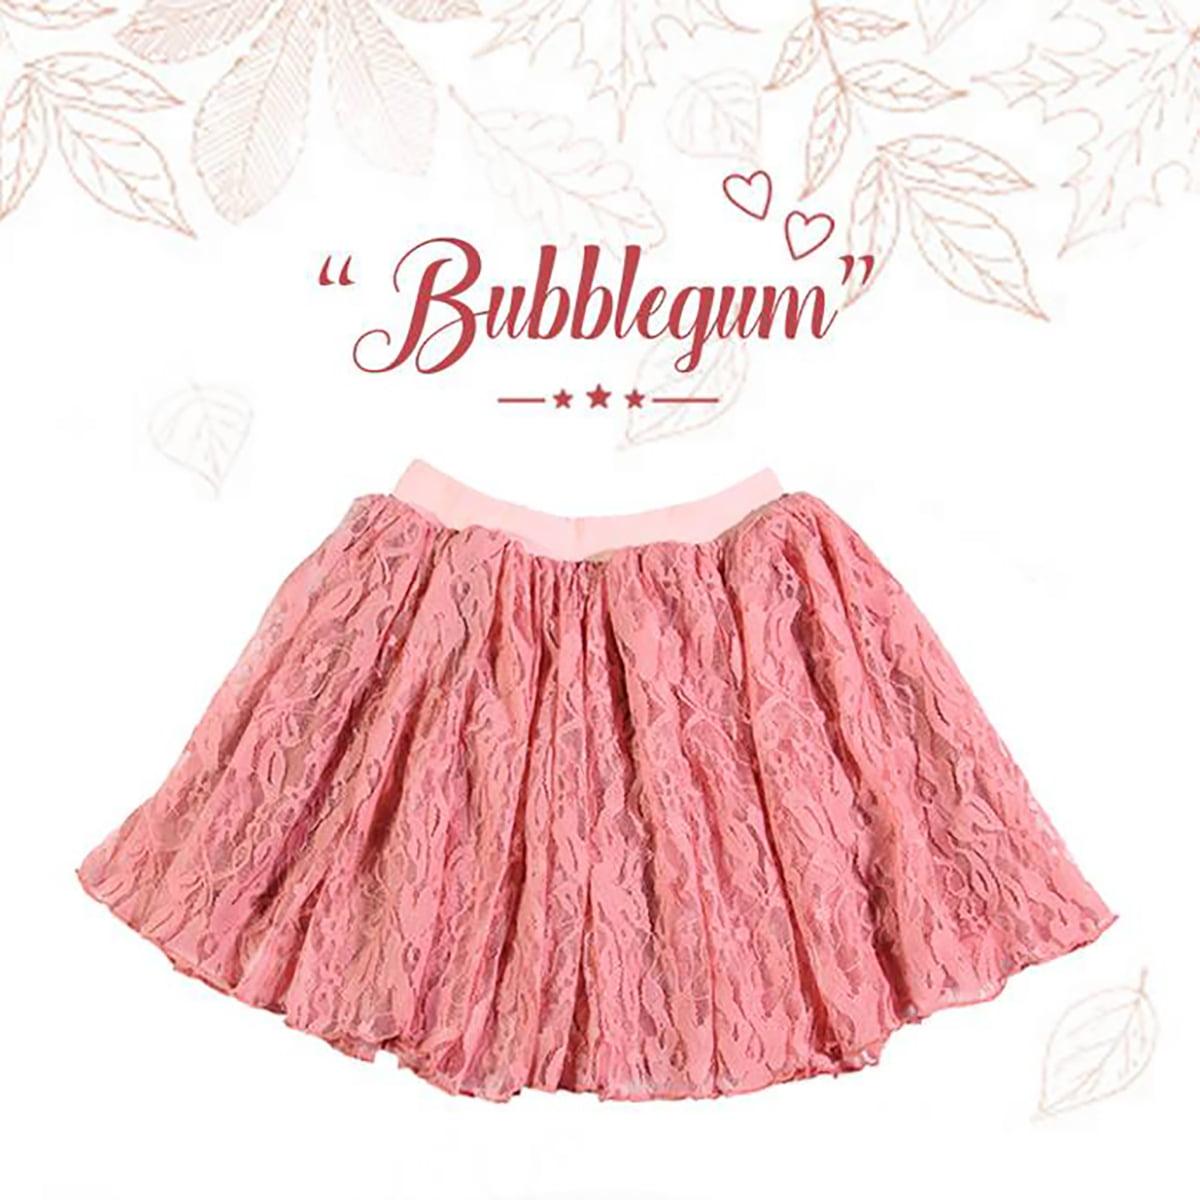 bubblegum lepršava roza suknja